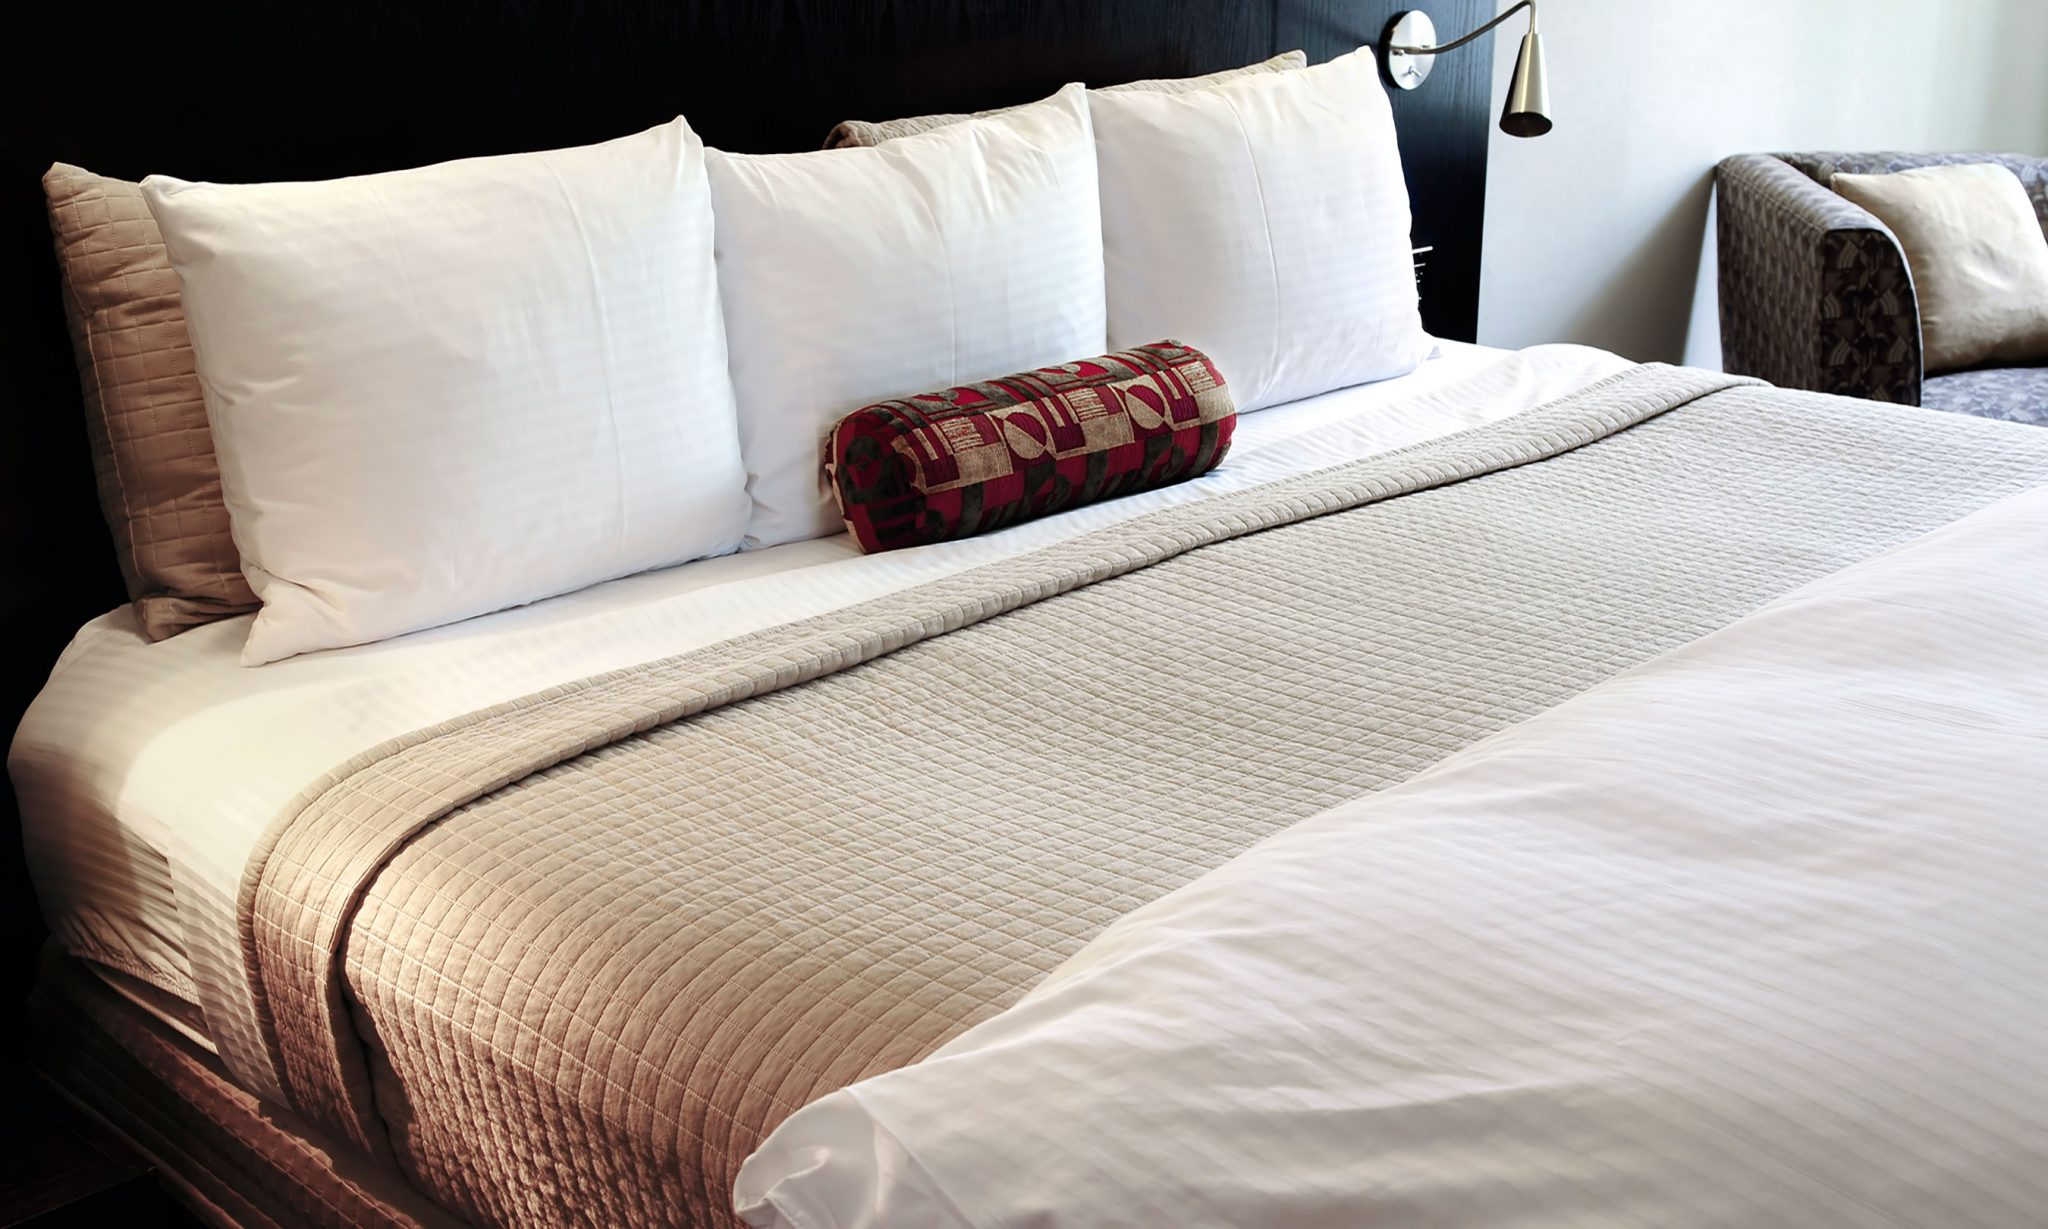 10% Discount for October Guests Ambassador Hotel Glasgow